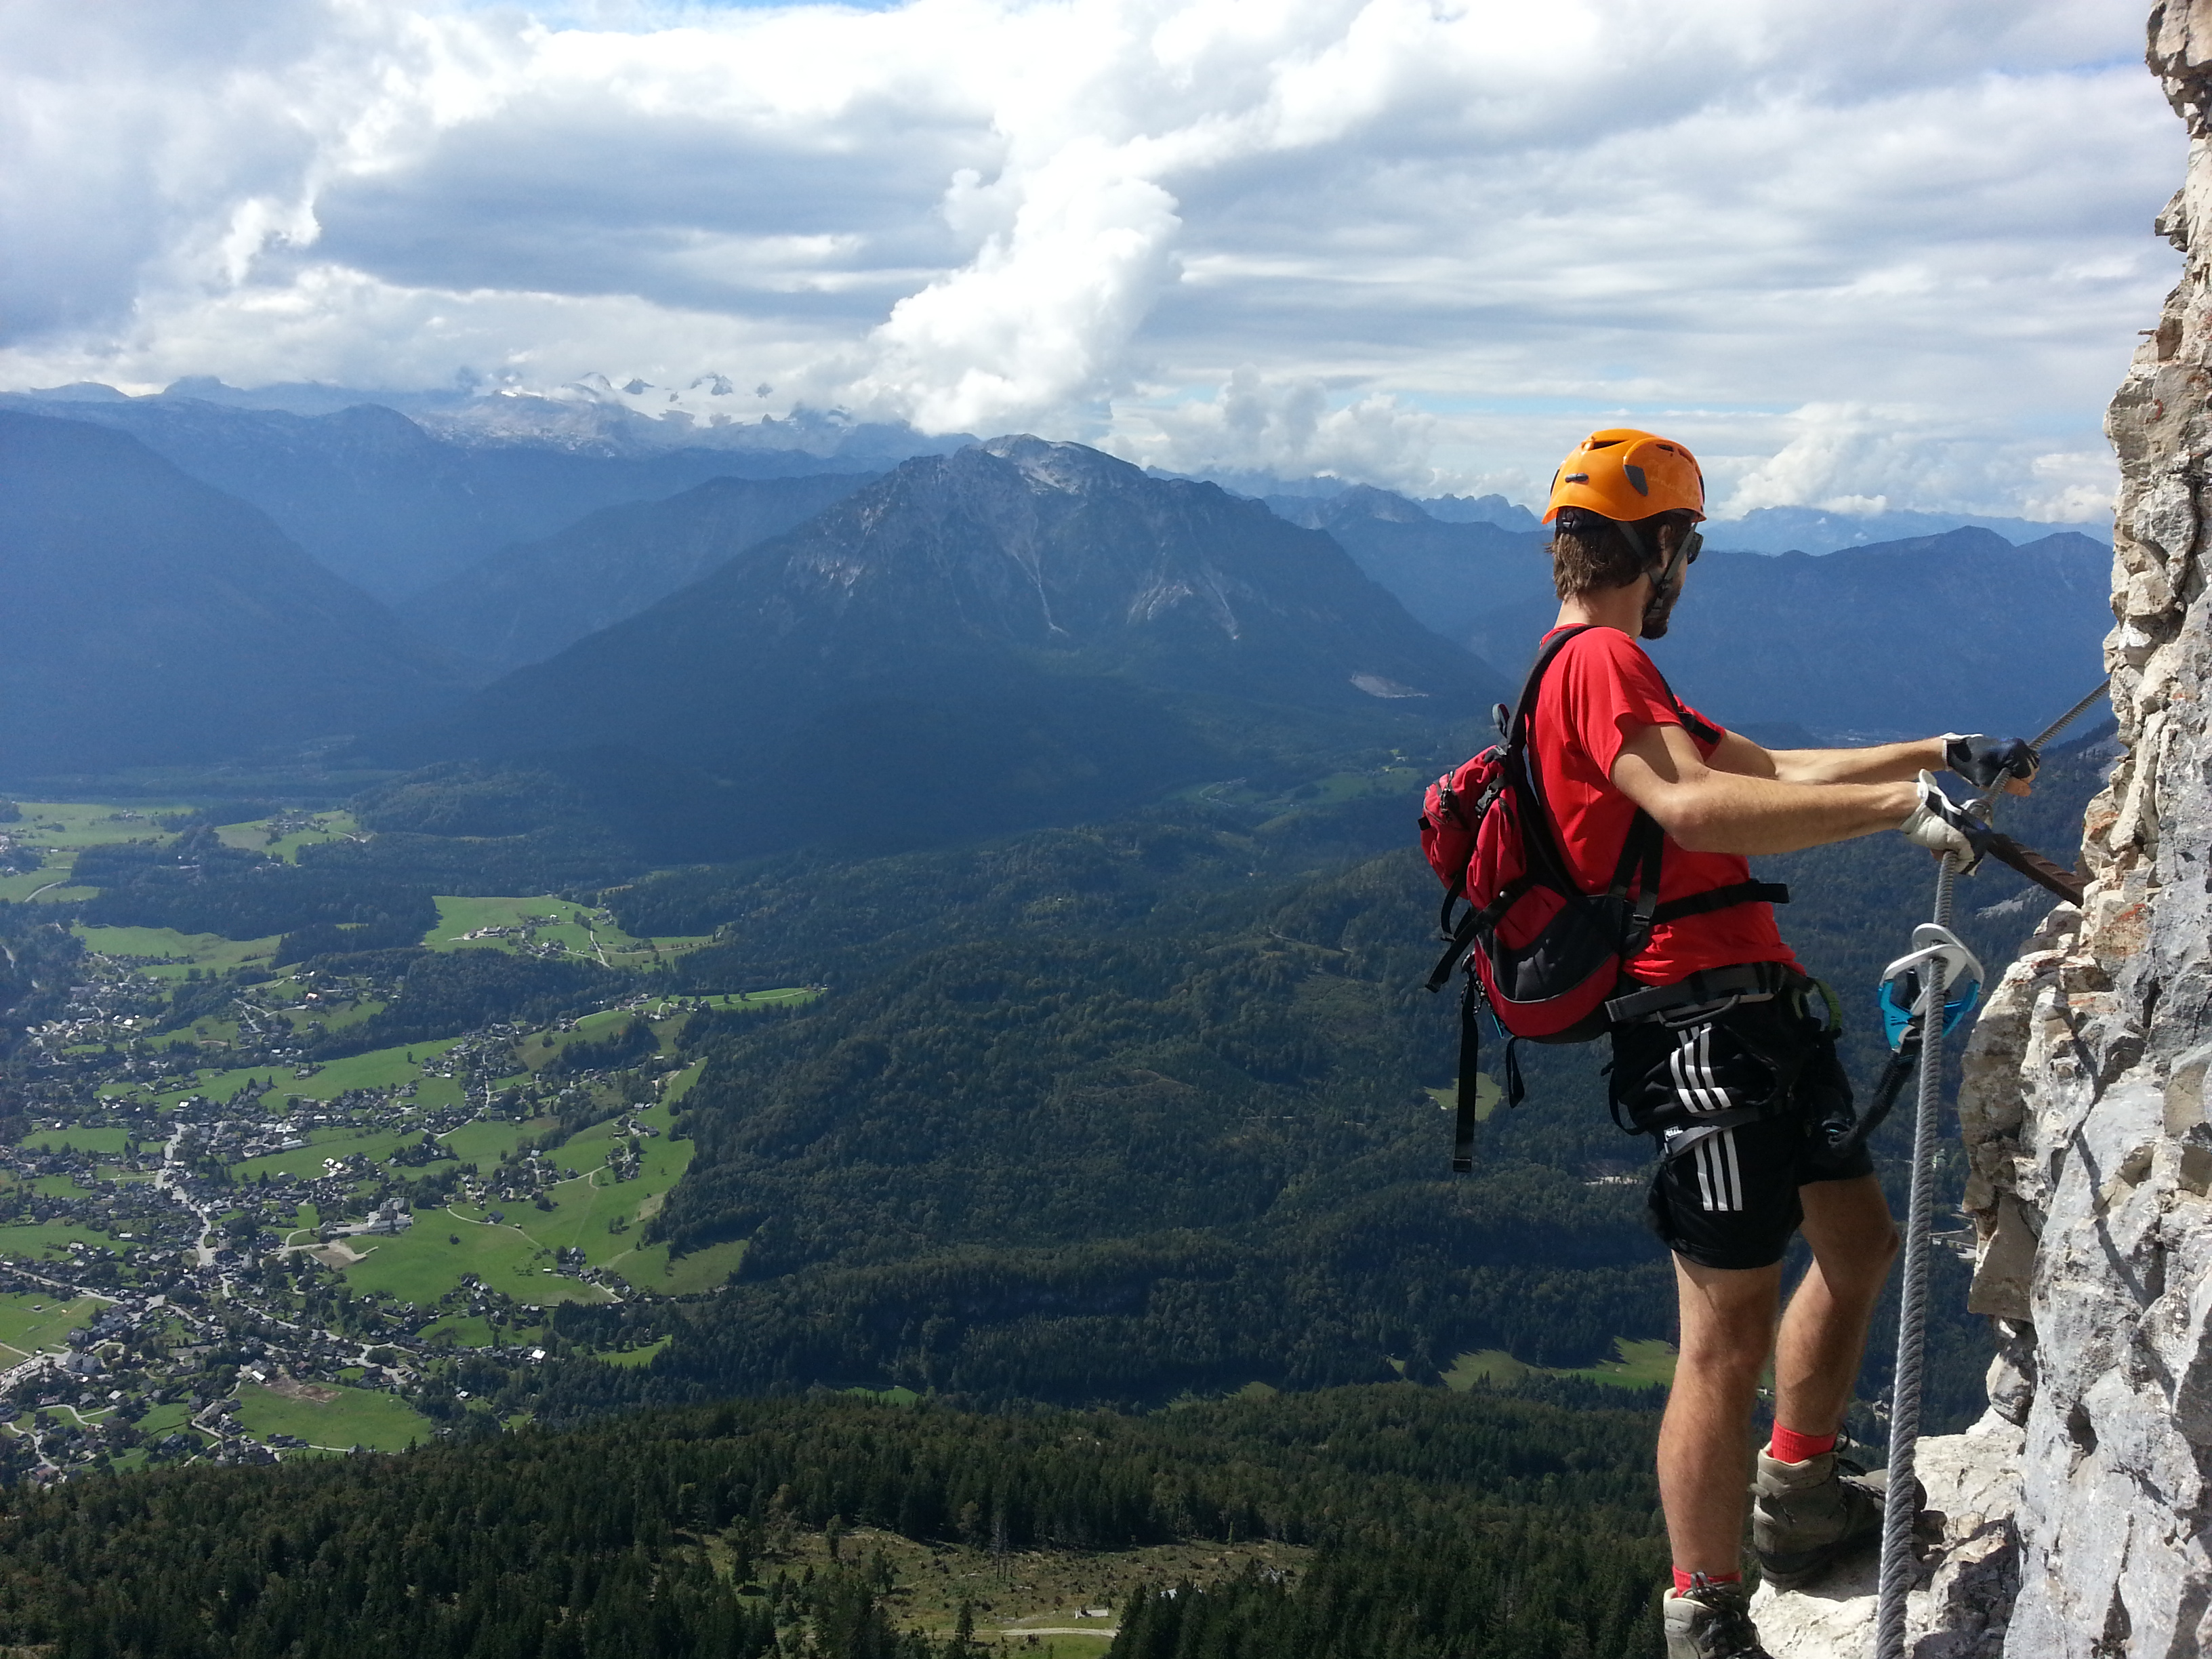 Klettersteig Fall : Klettersteig check der heini holzer b c